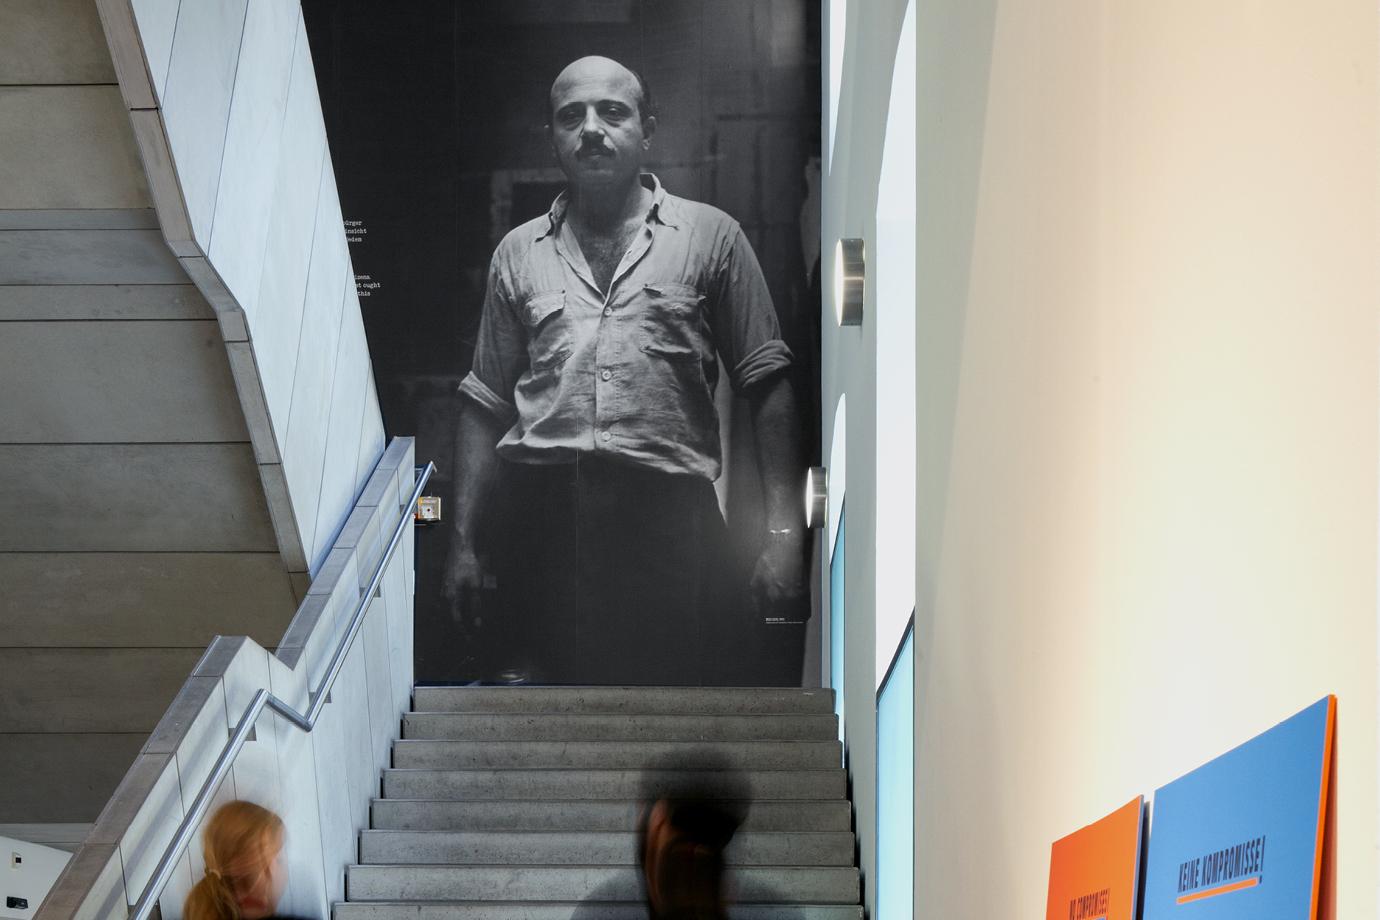 http://e-o-t.de/wordpress/wp-content/uploads/2017/03/Slide-Exhibition_Lurie_2.jpg